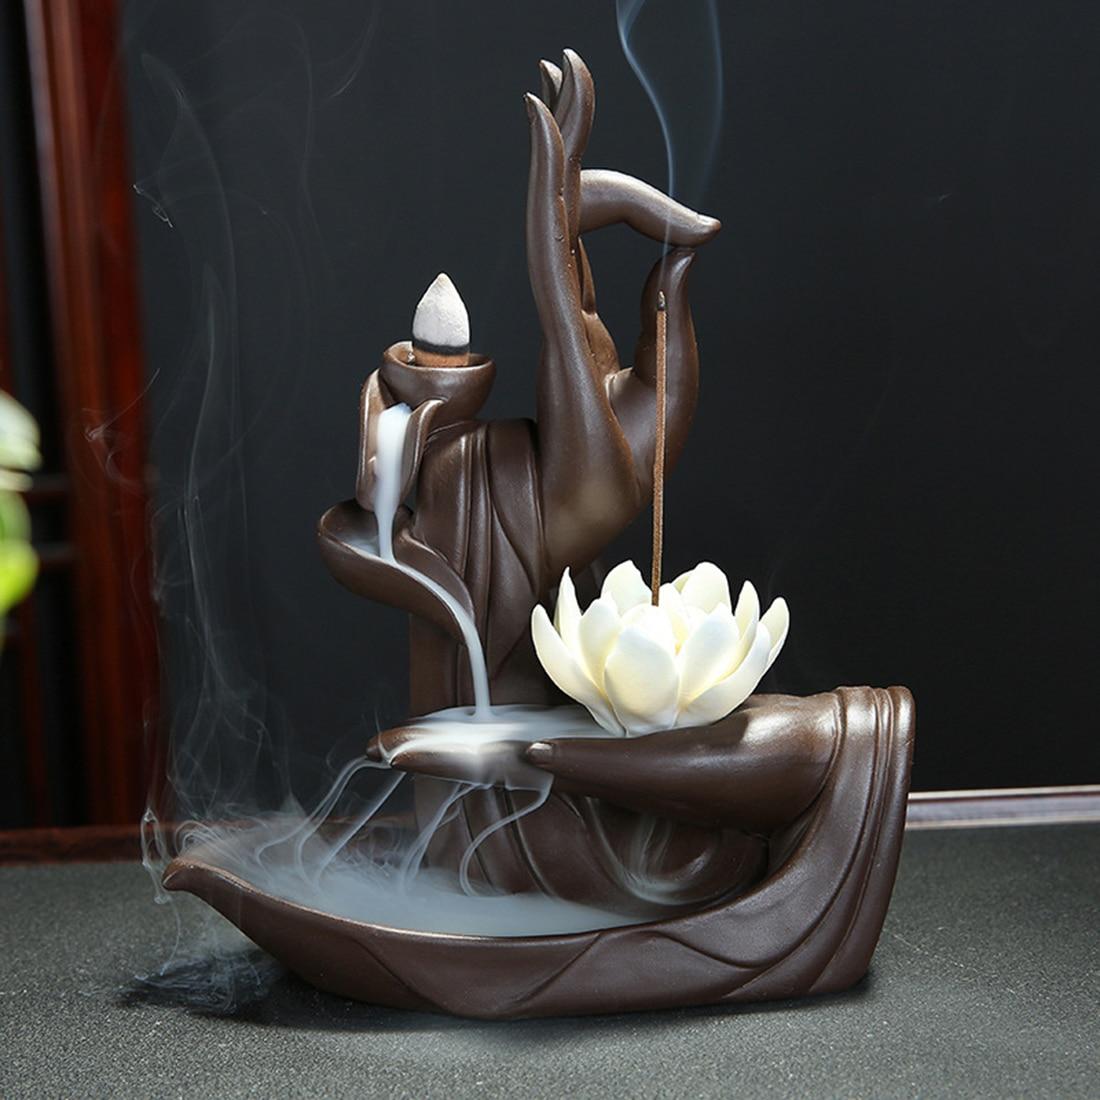 Refluxo Tathagata Buda Queimador de Incenso de Lótus cerâmica Incenso Cone Incenso Cones Titular da Vara + 10 pc Bouddha Creative Home Decor